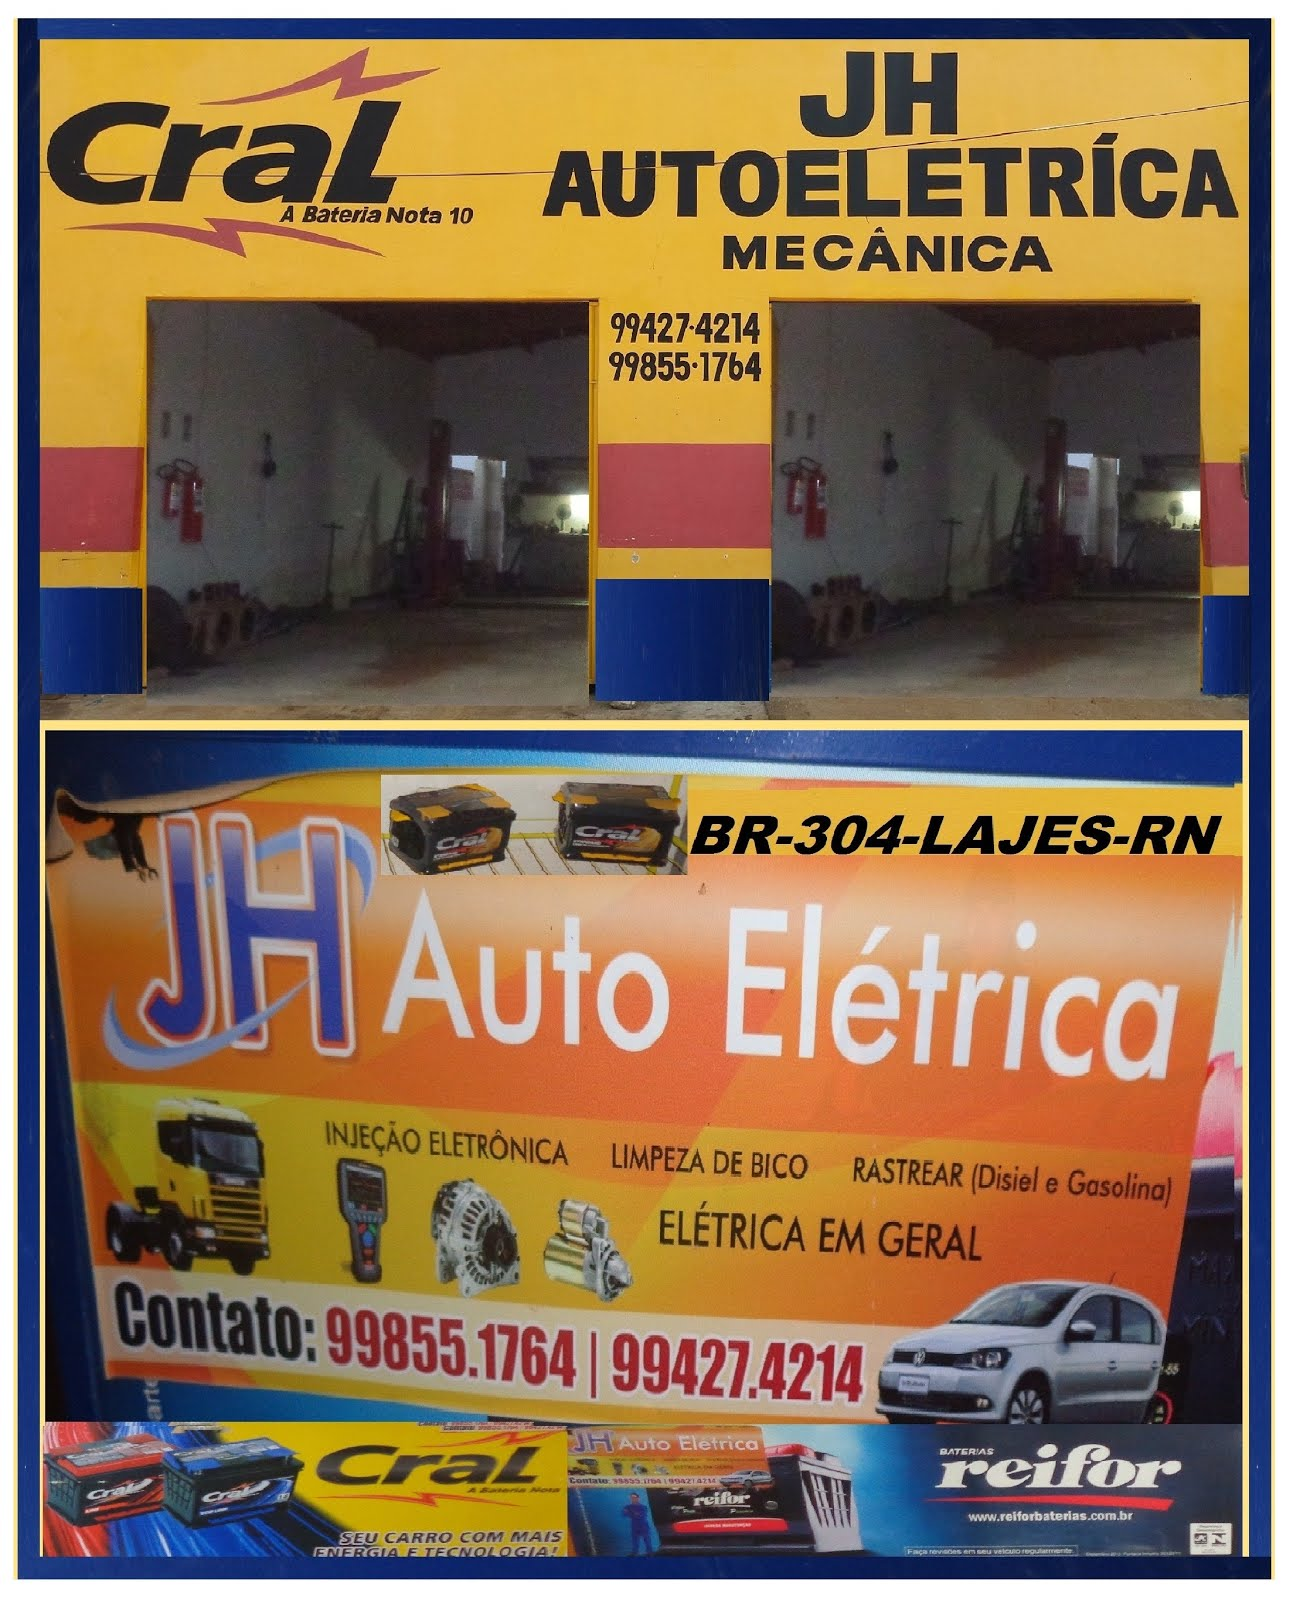 JH.AUTO ELÉTRICA MECÂNICA